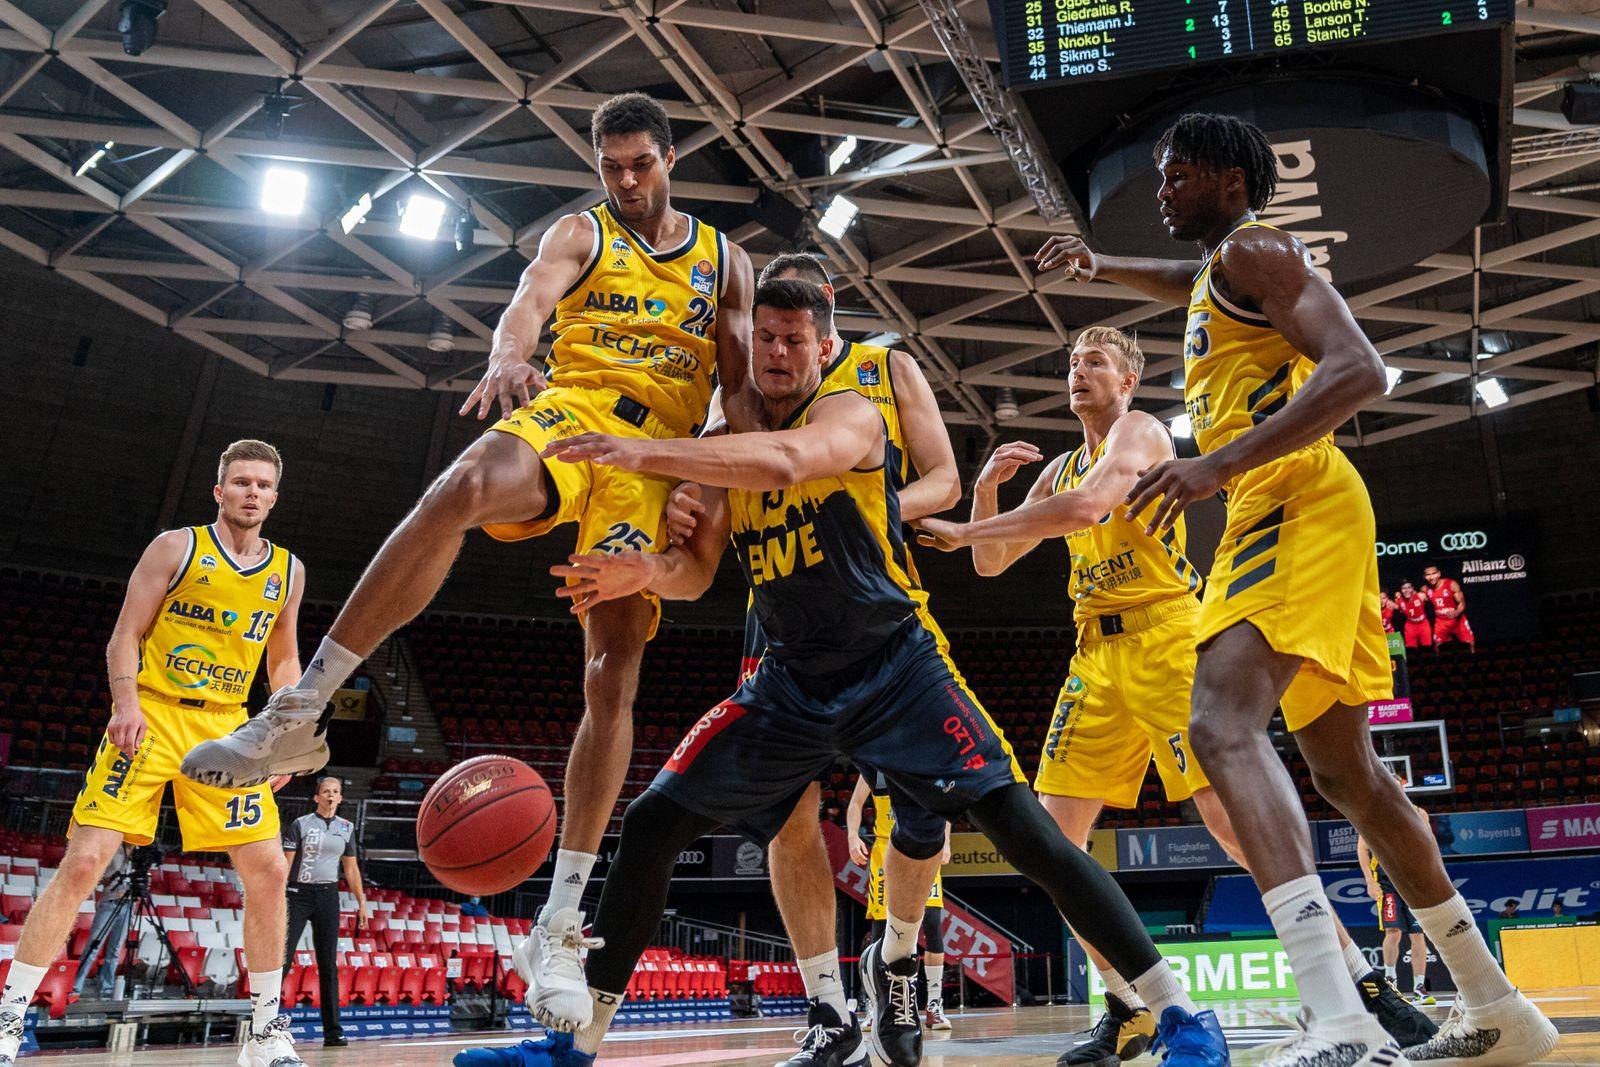 Sport Bilder des Tages 24.06.2020 Basketball easyCredit Final-Turnier Basketball München 24.06.2020 Saison 2019 / 2020 e